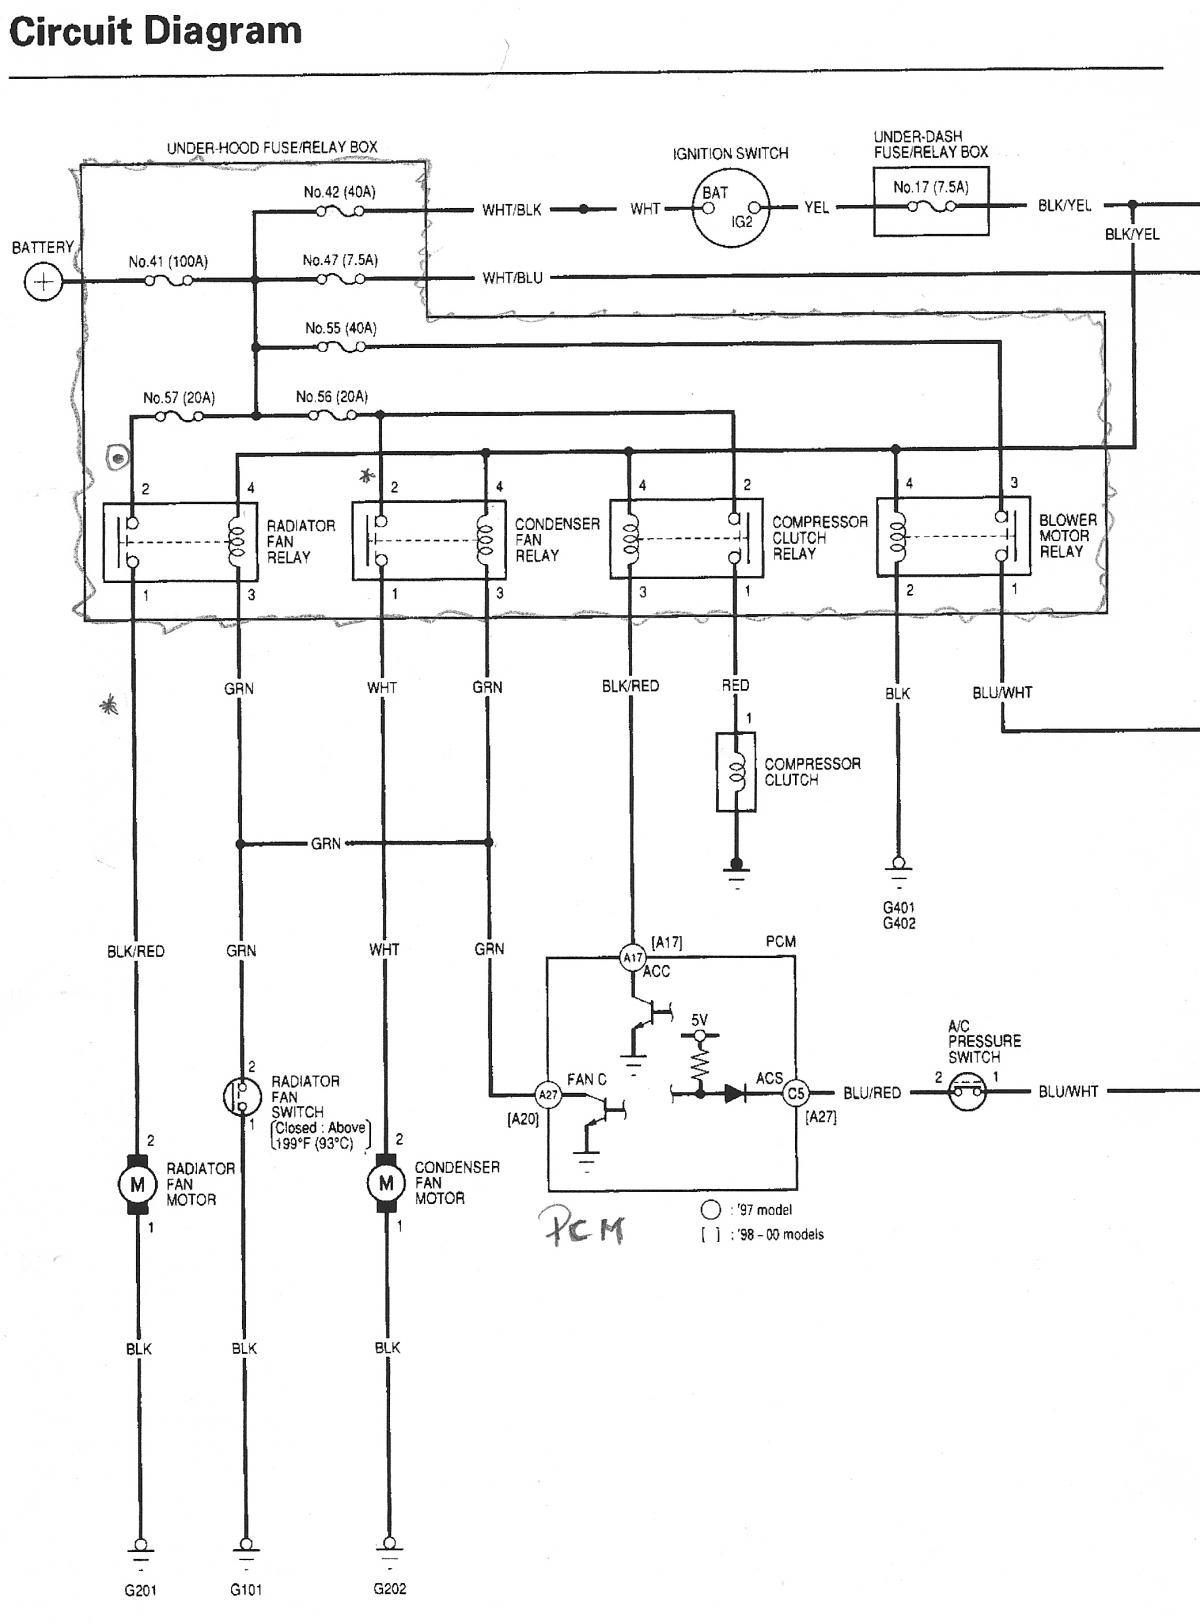 Wiring diagram for 2001 honda cr v wiring diagrams schematics extraordinary 1998 honda crv wiring diagram ideas best image astonishing honda crv radio wiring diagram images best image wiring diagram for 2001 honda cr v pooptronica Gallery